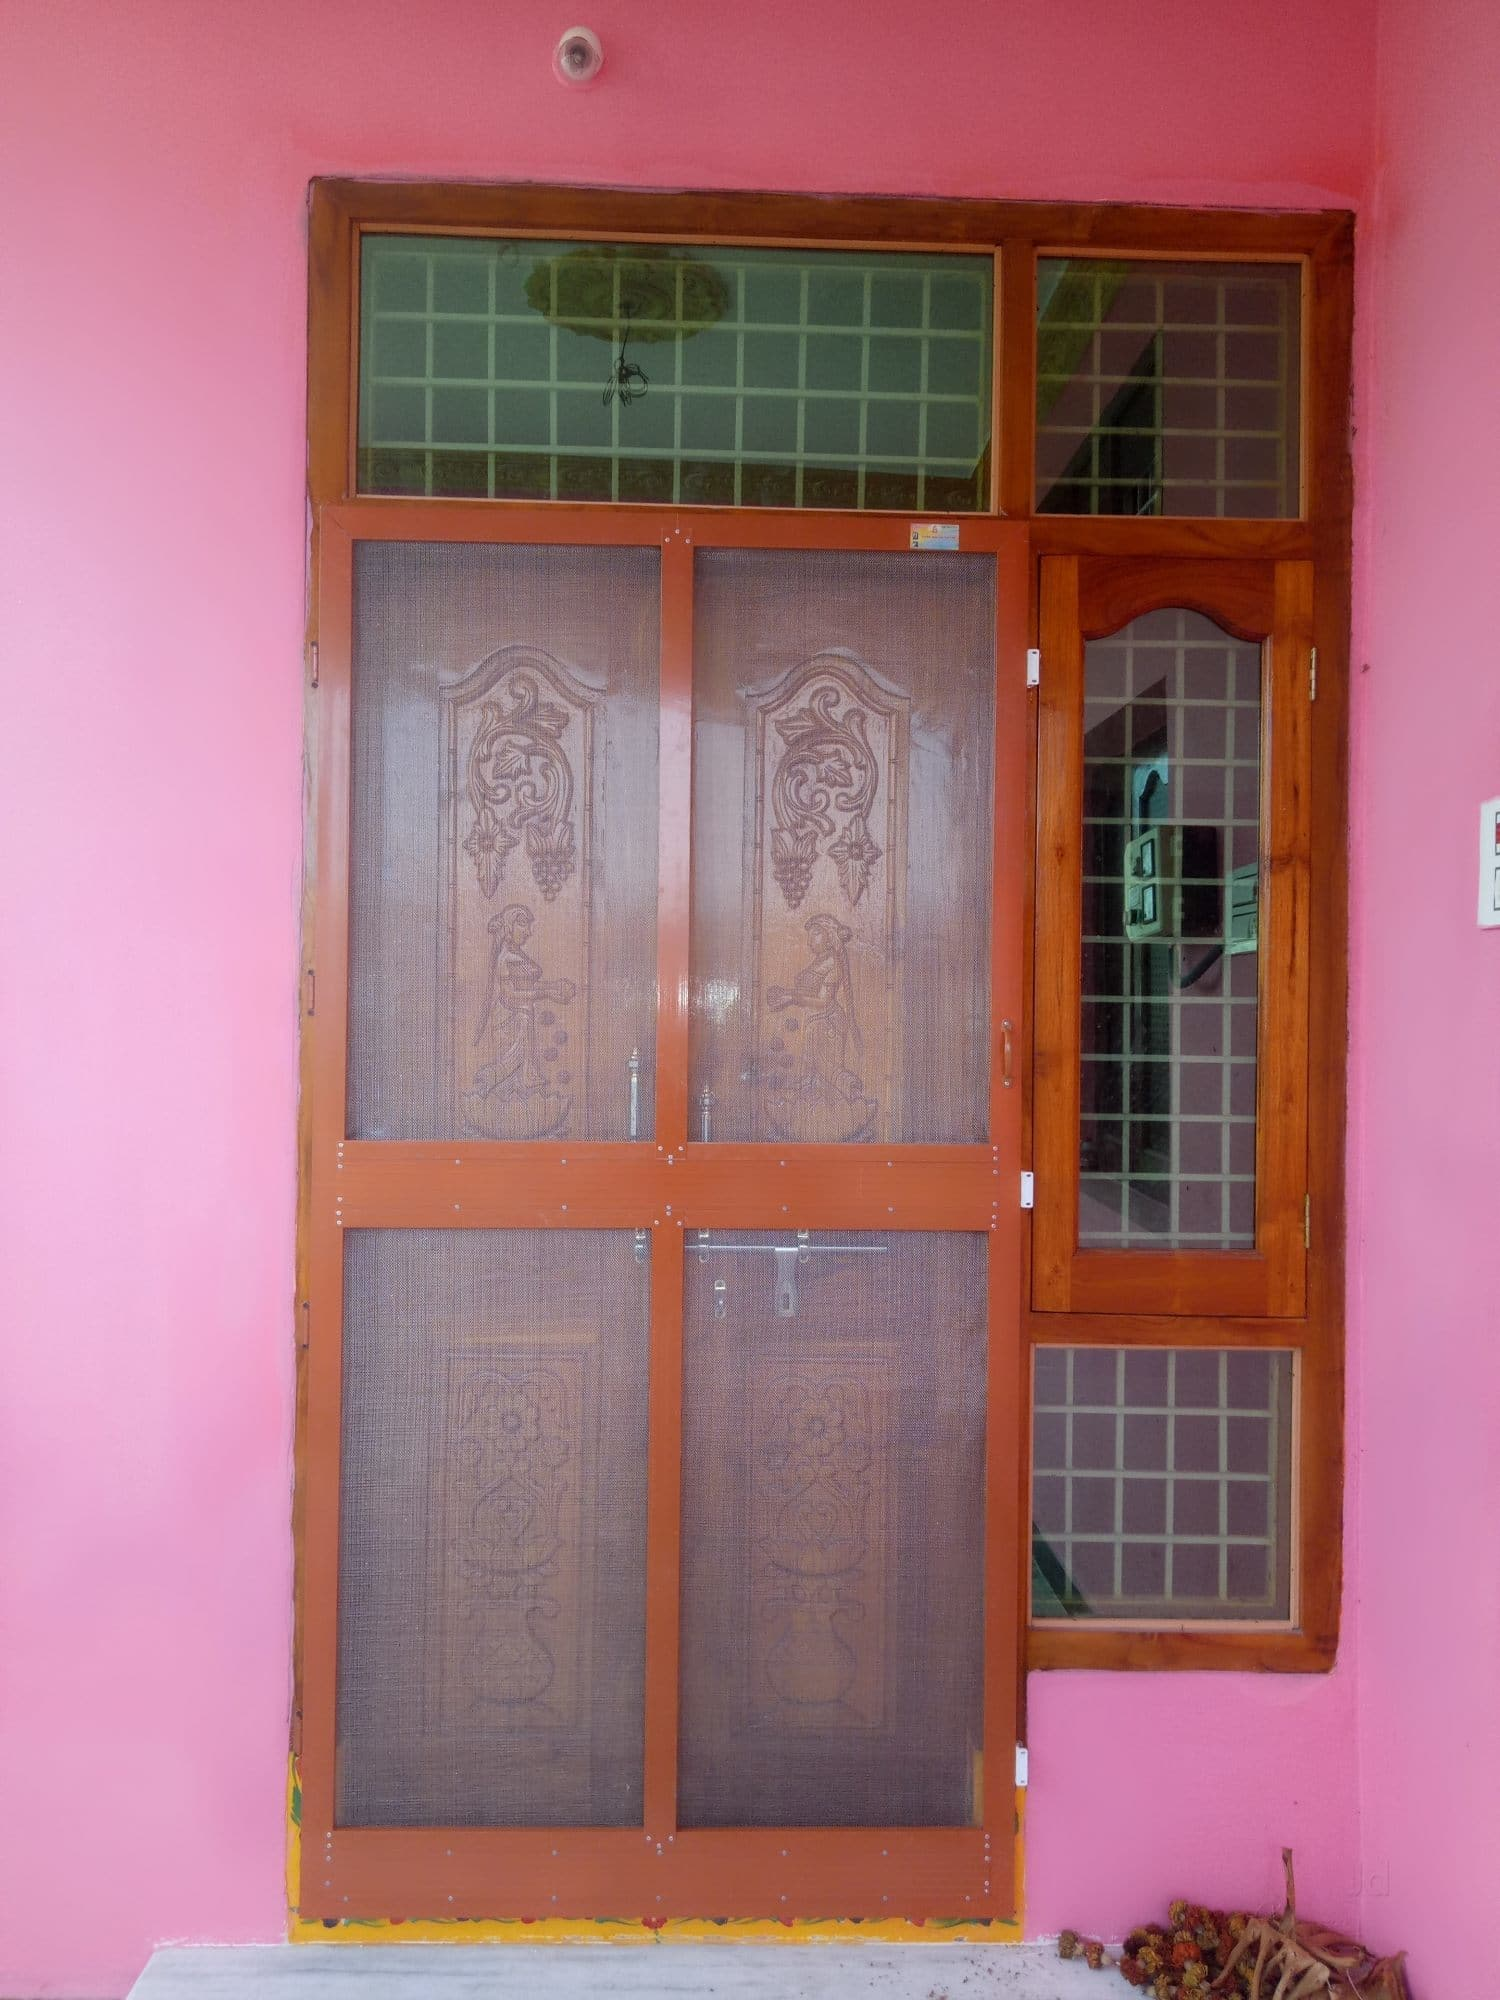 Wood Tv 8 Mosquito Mosquito Doors ...